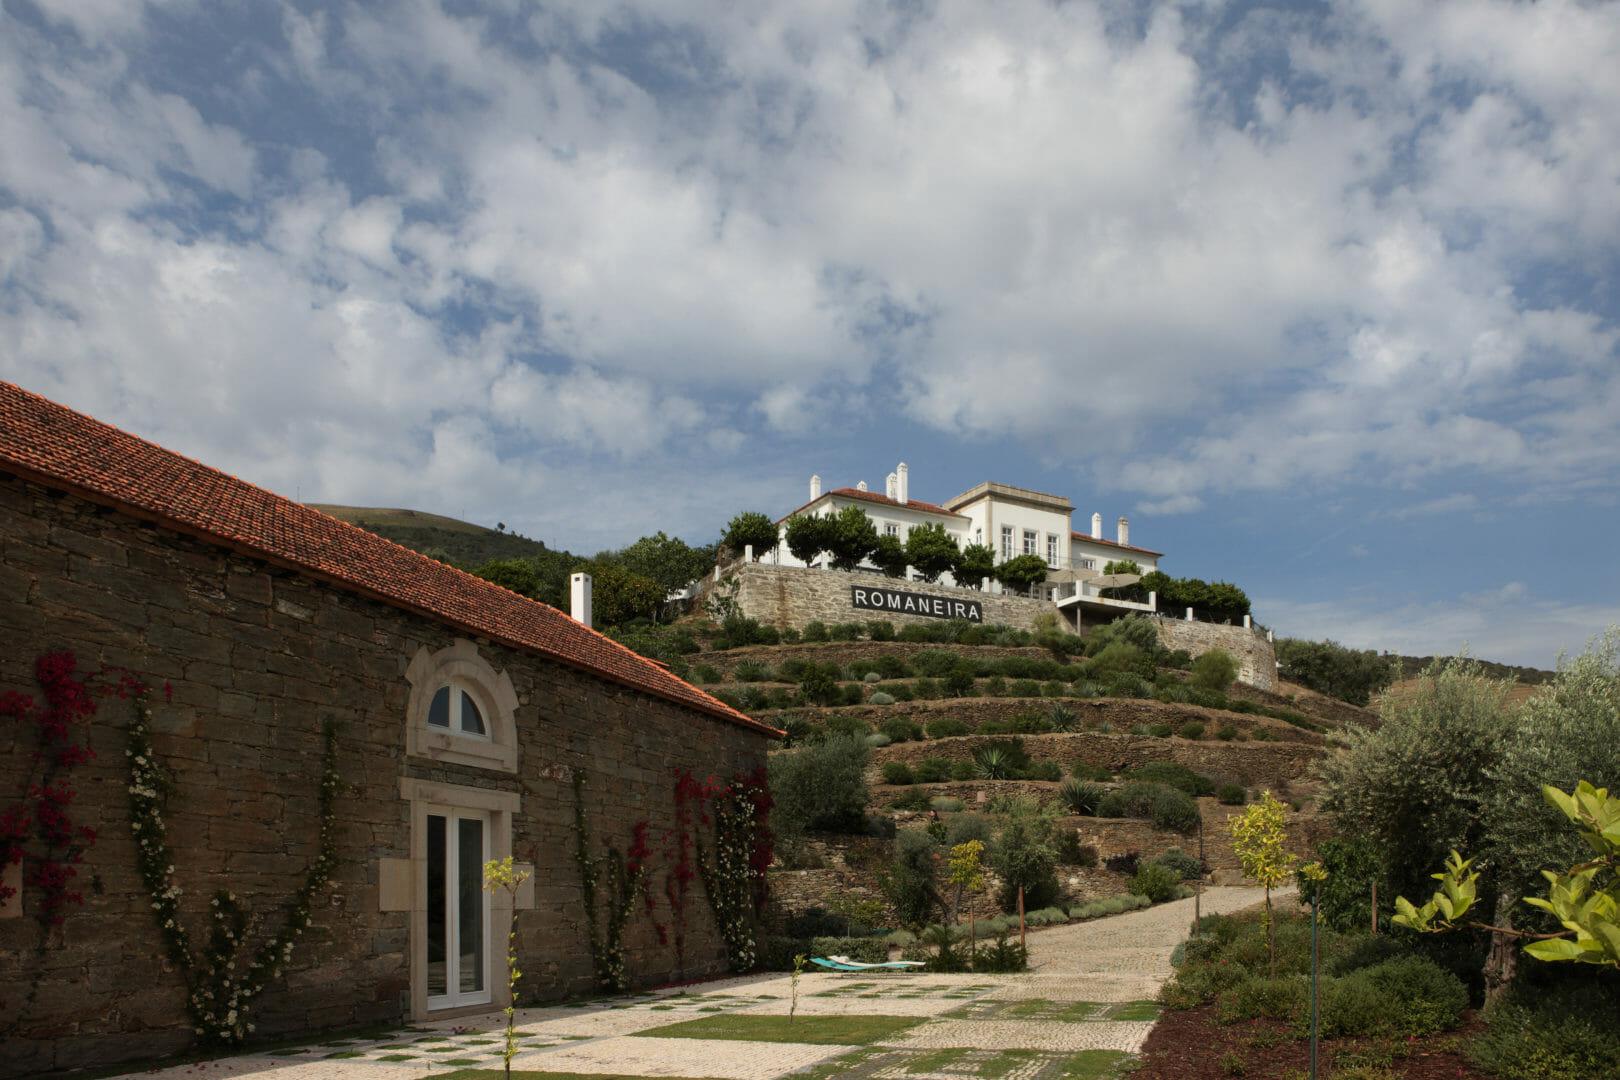 Quinta da Romaneira Vintage 2019